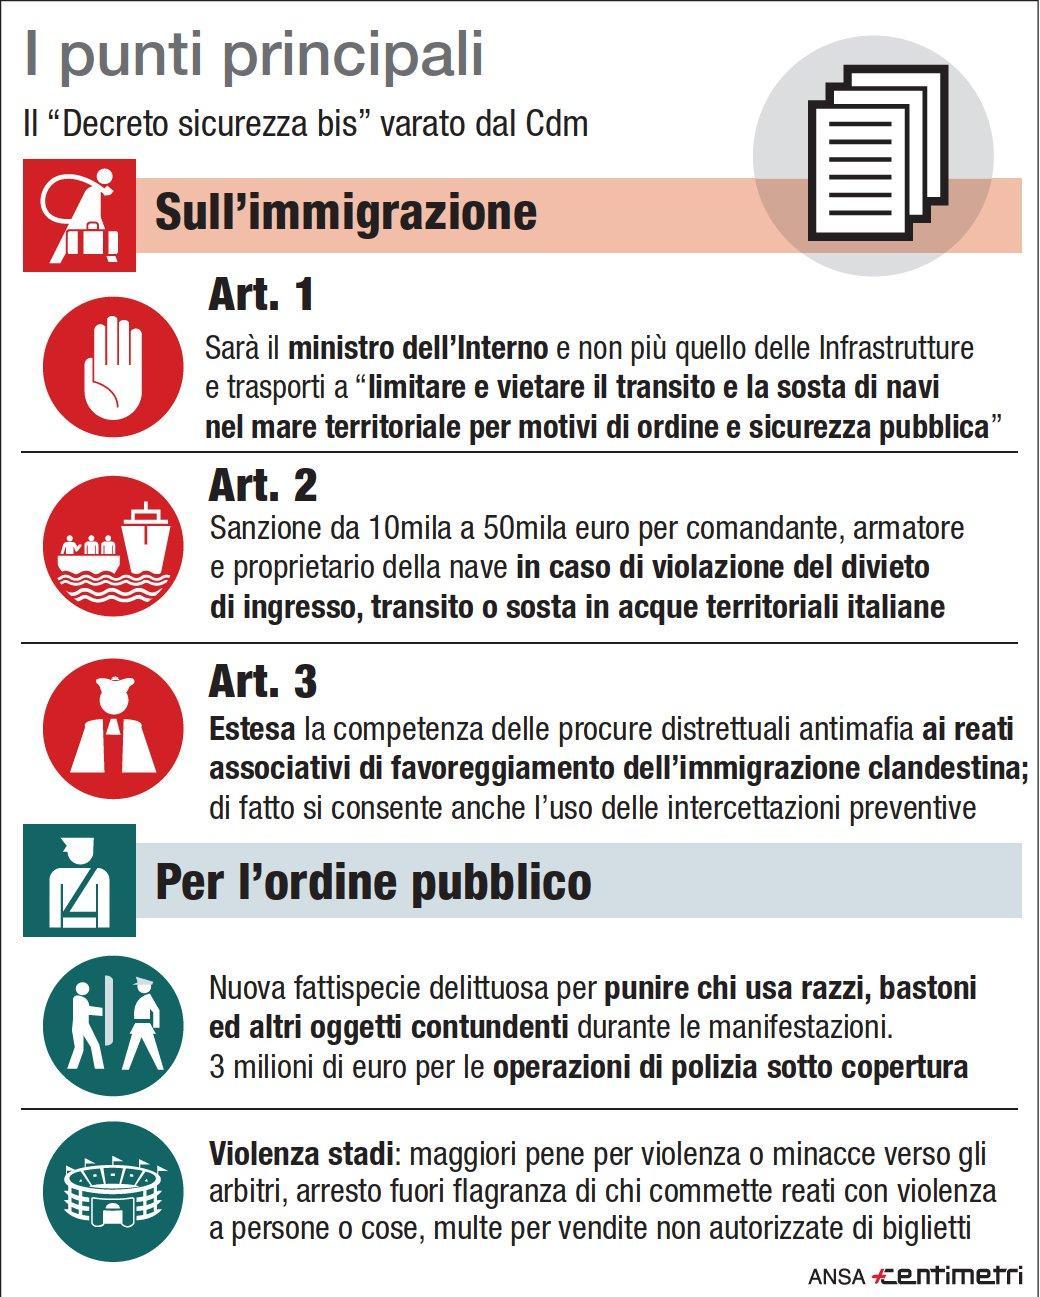 Decreto sicurezza bis, i punti principali